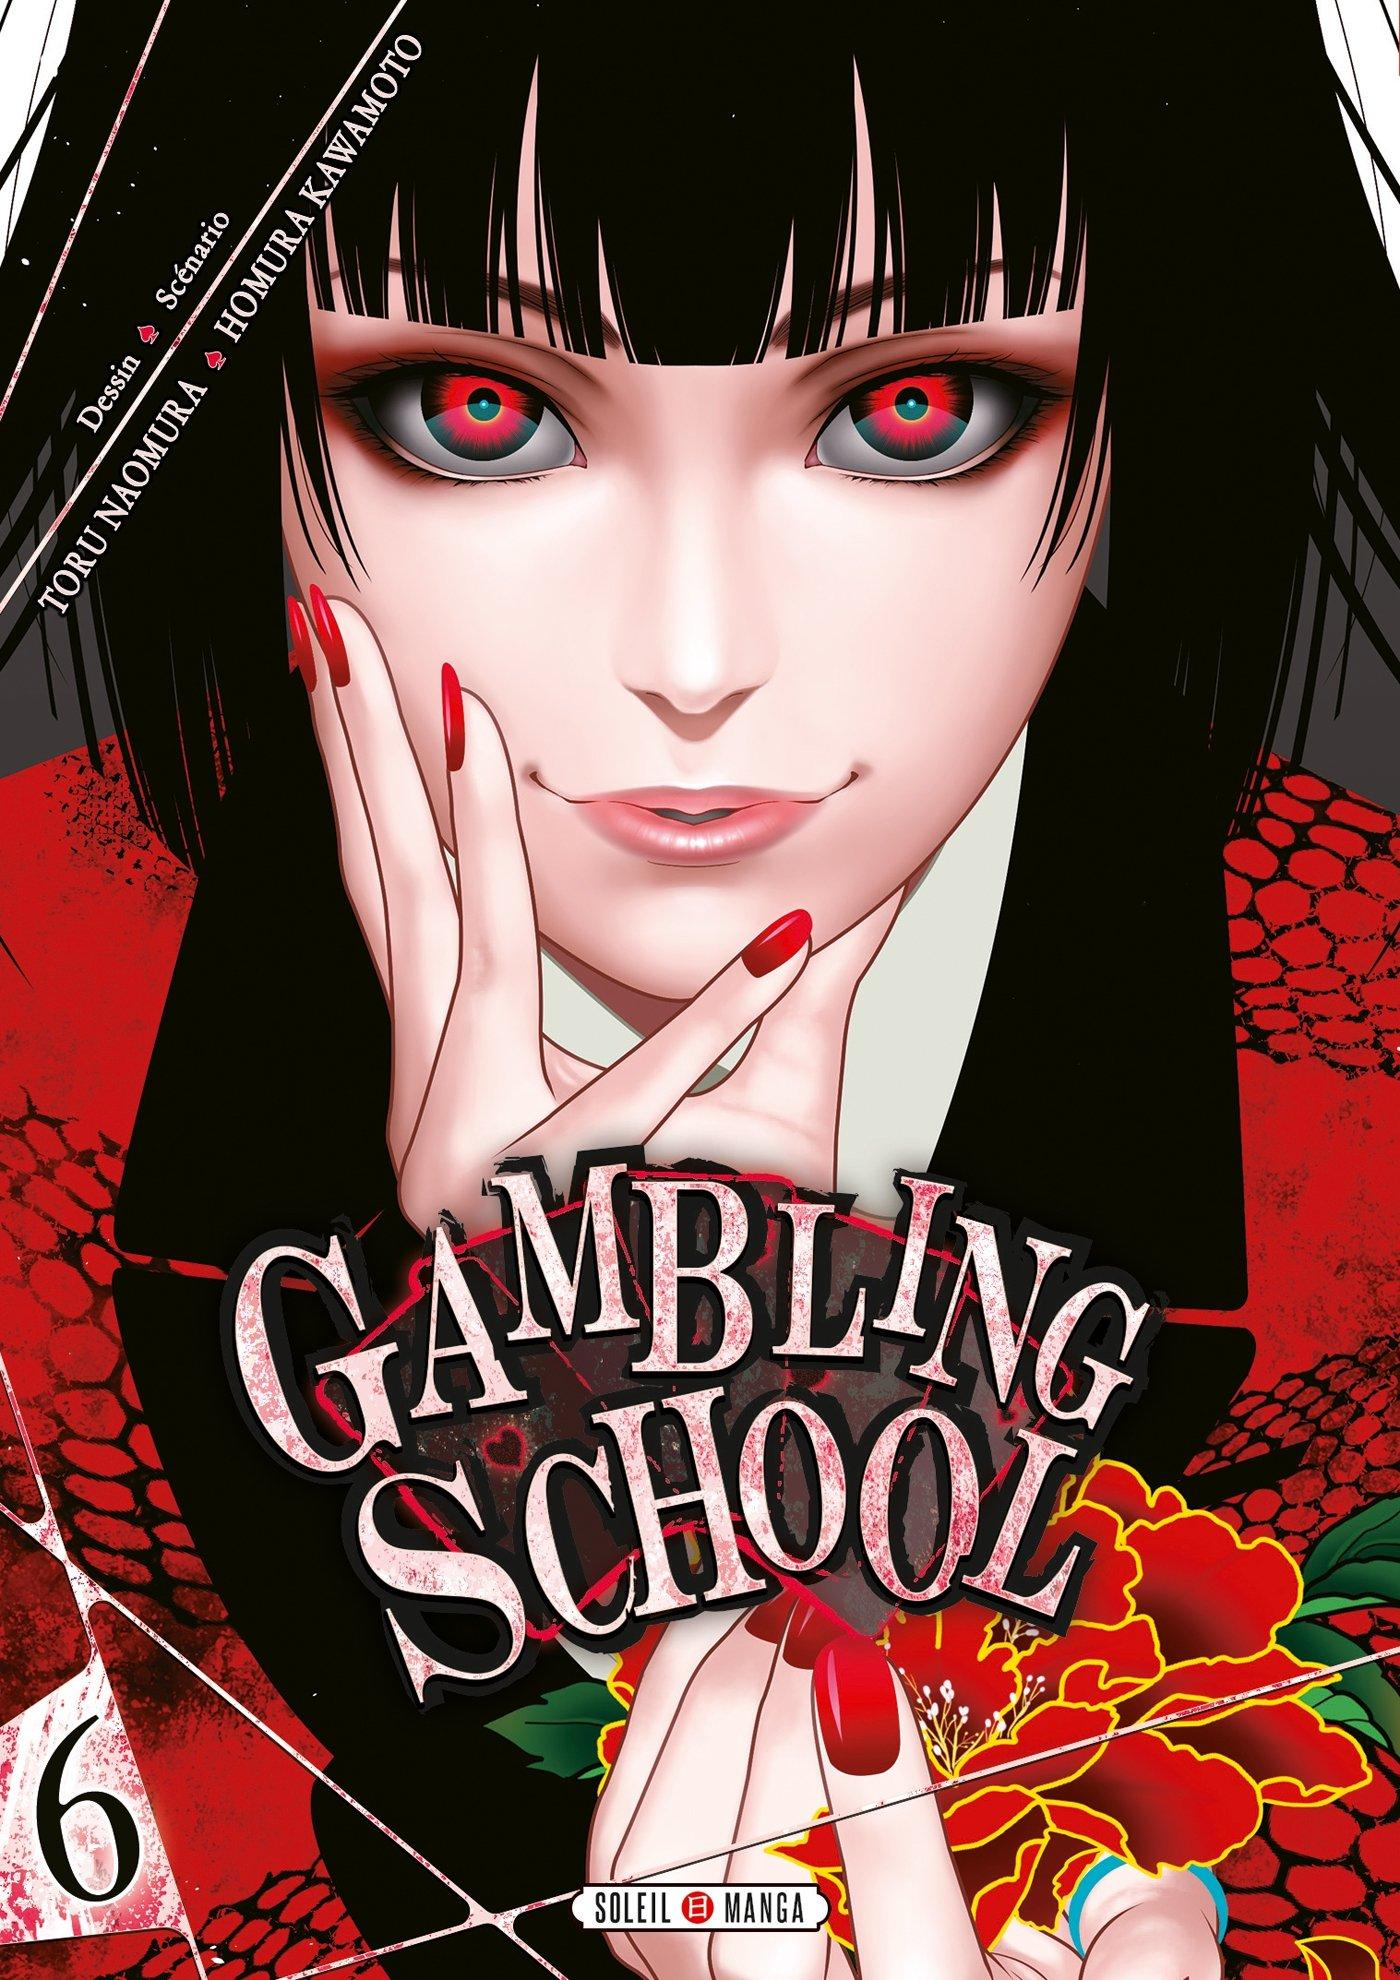 Gambling School 6